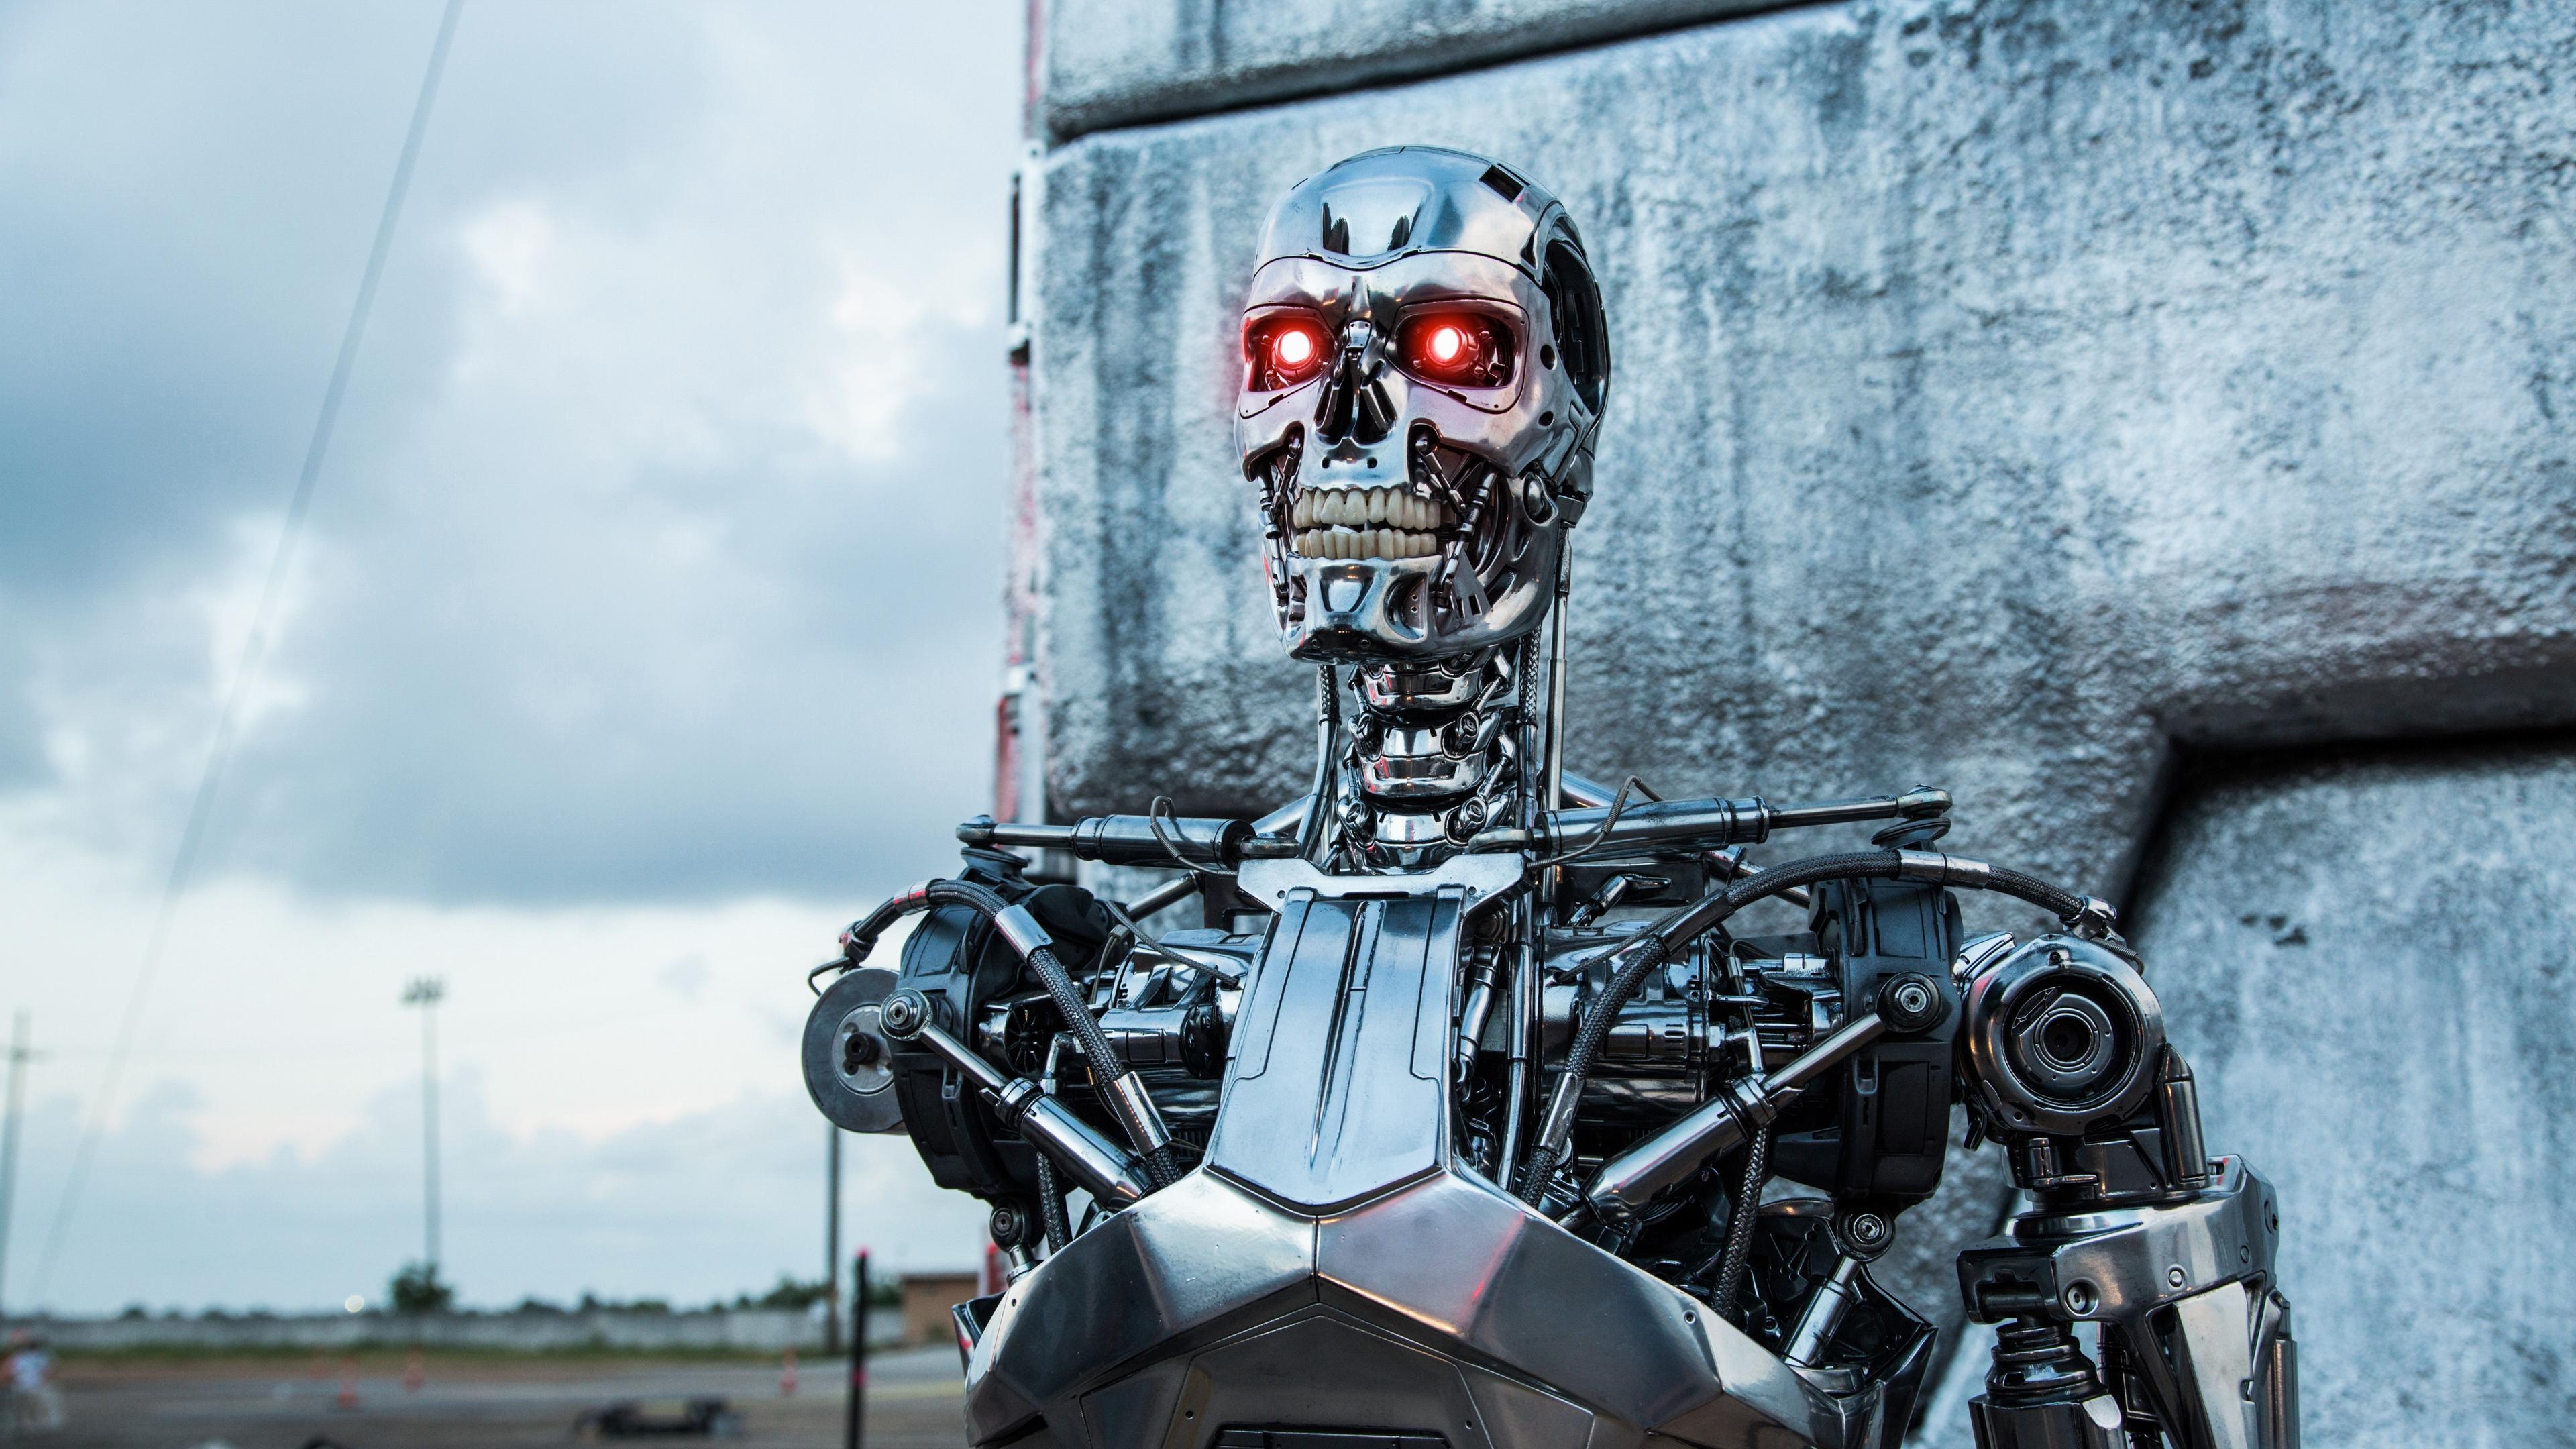 genesis terminator robot t 800 4k 1539368181 - genesis, terminator, robot, t-800 4k - terminator, Robot, Genesis